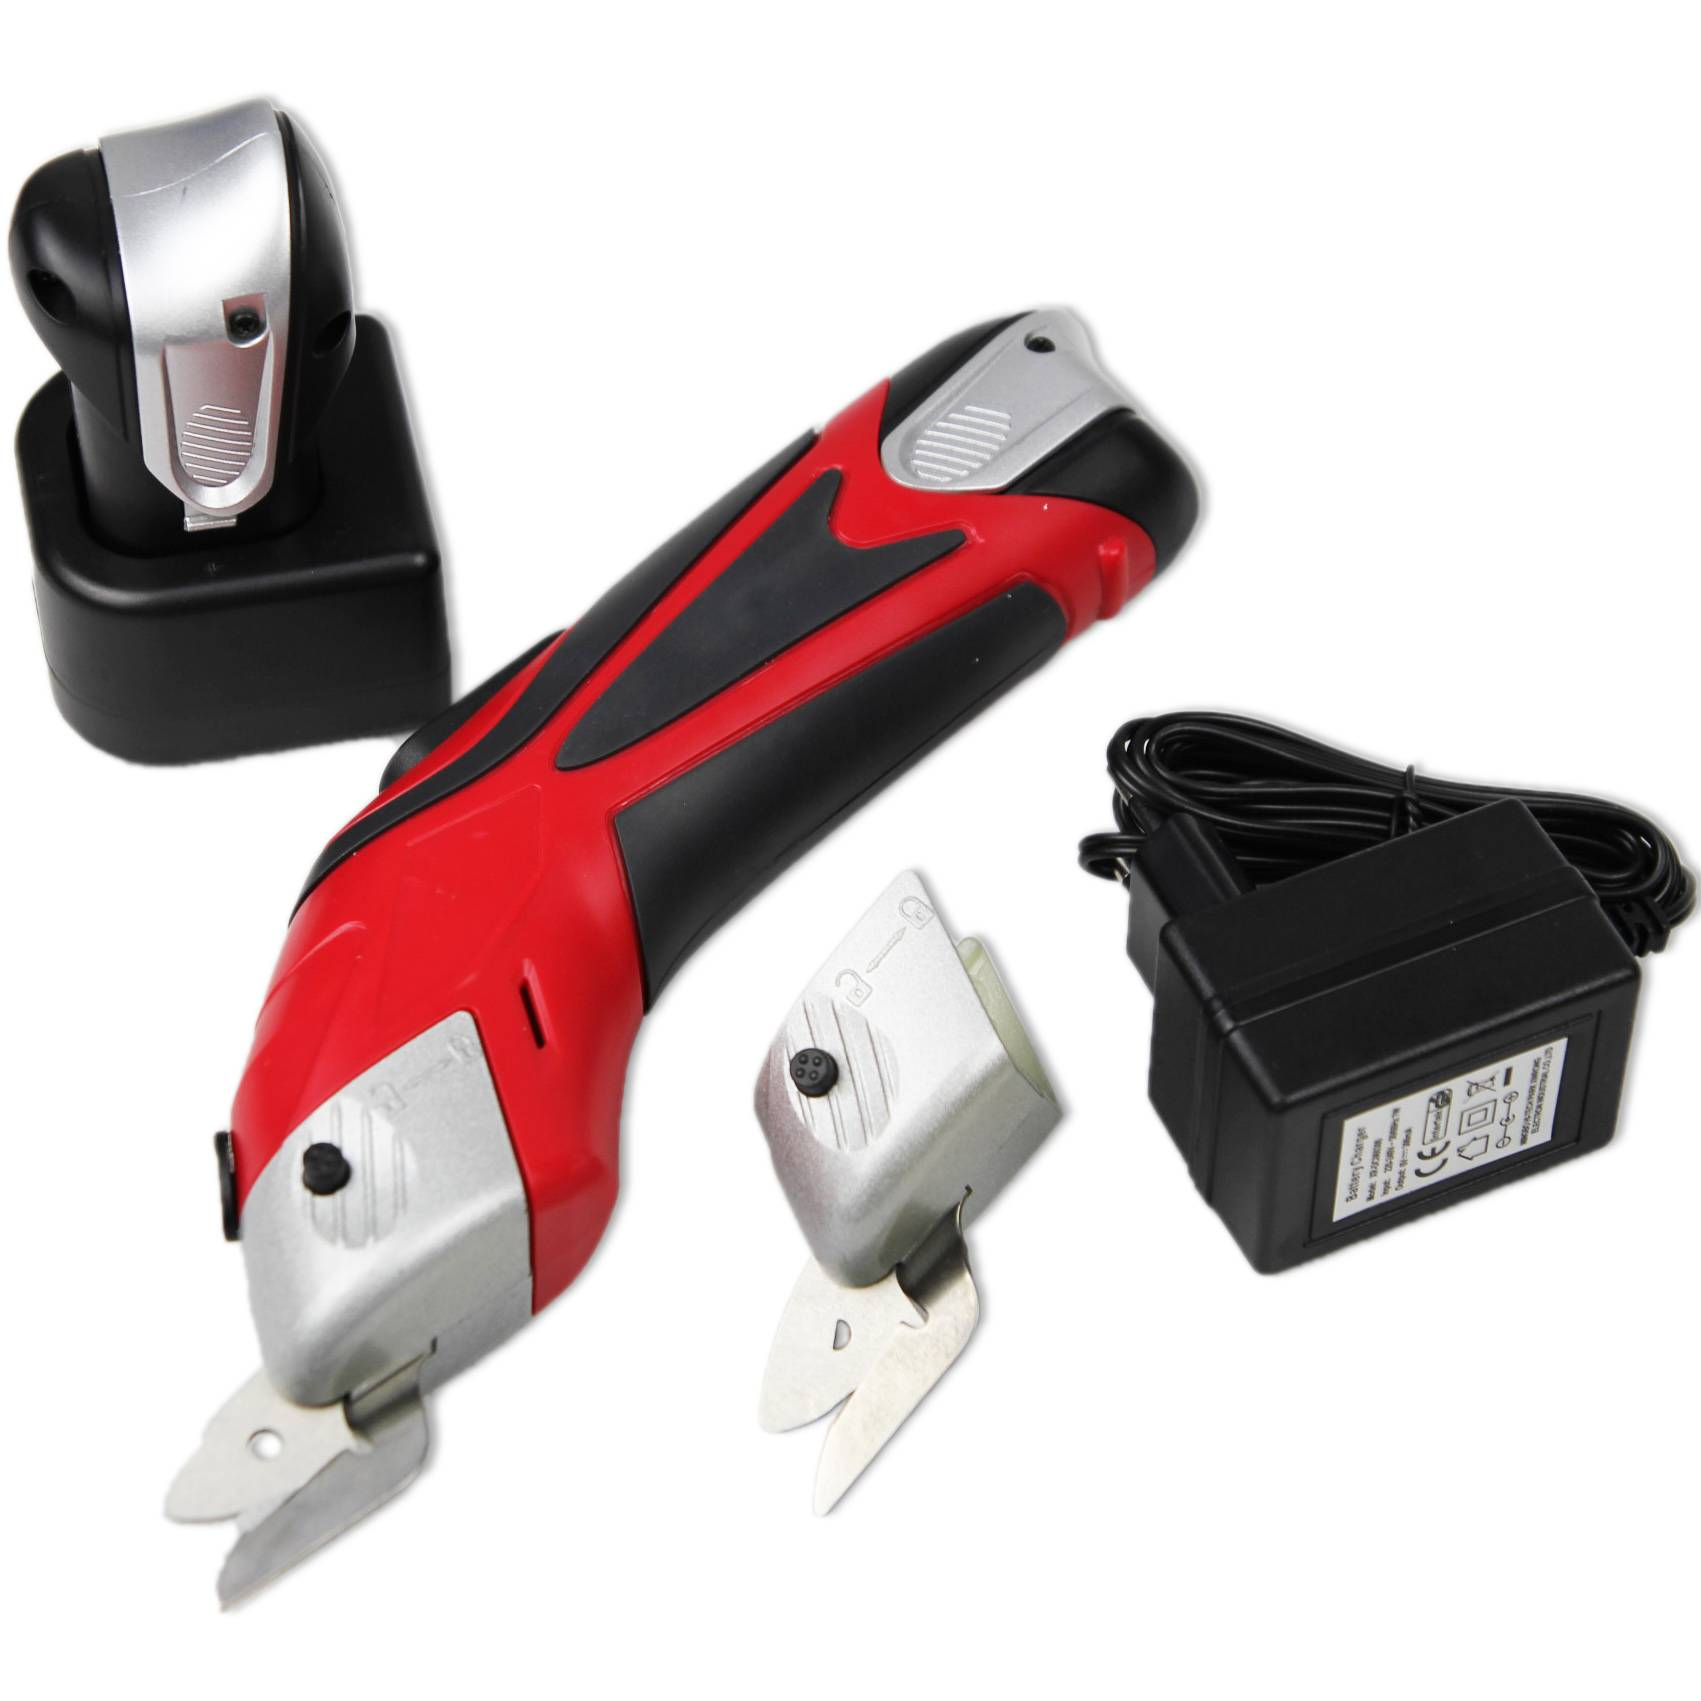 Battery cordless electric scissors